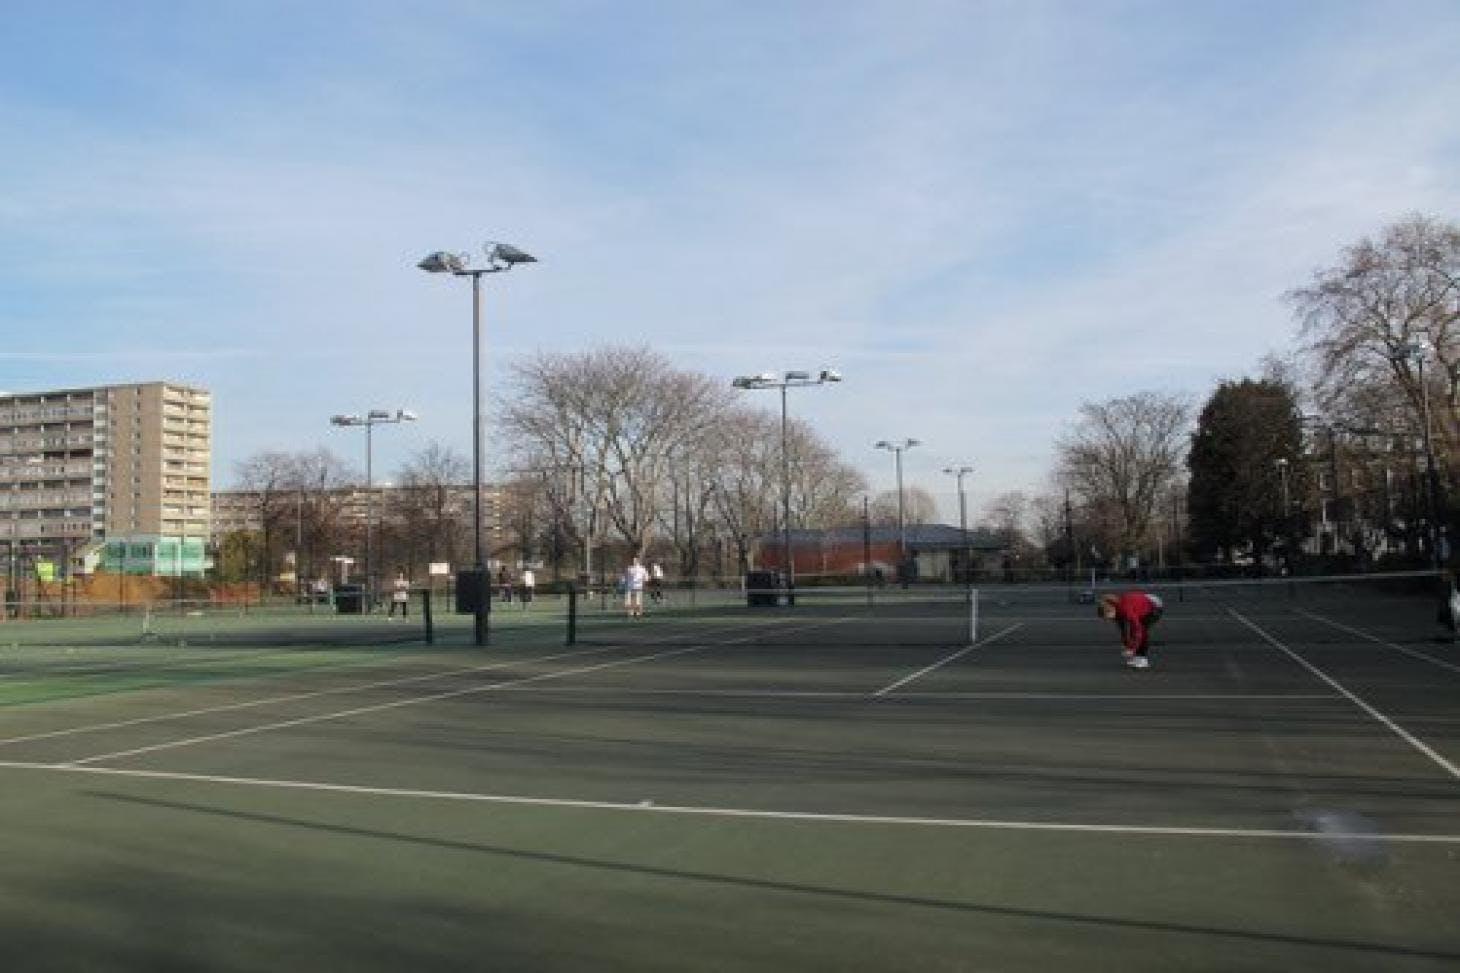 Burgess Park Outdoor | Hard (macadam) tennis court